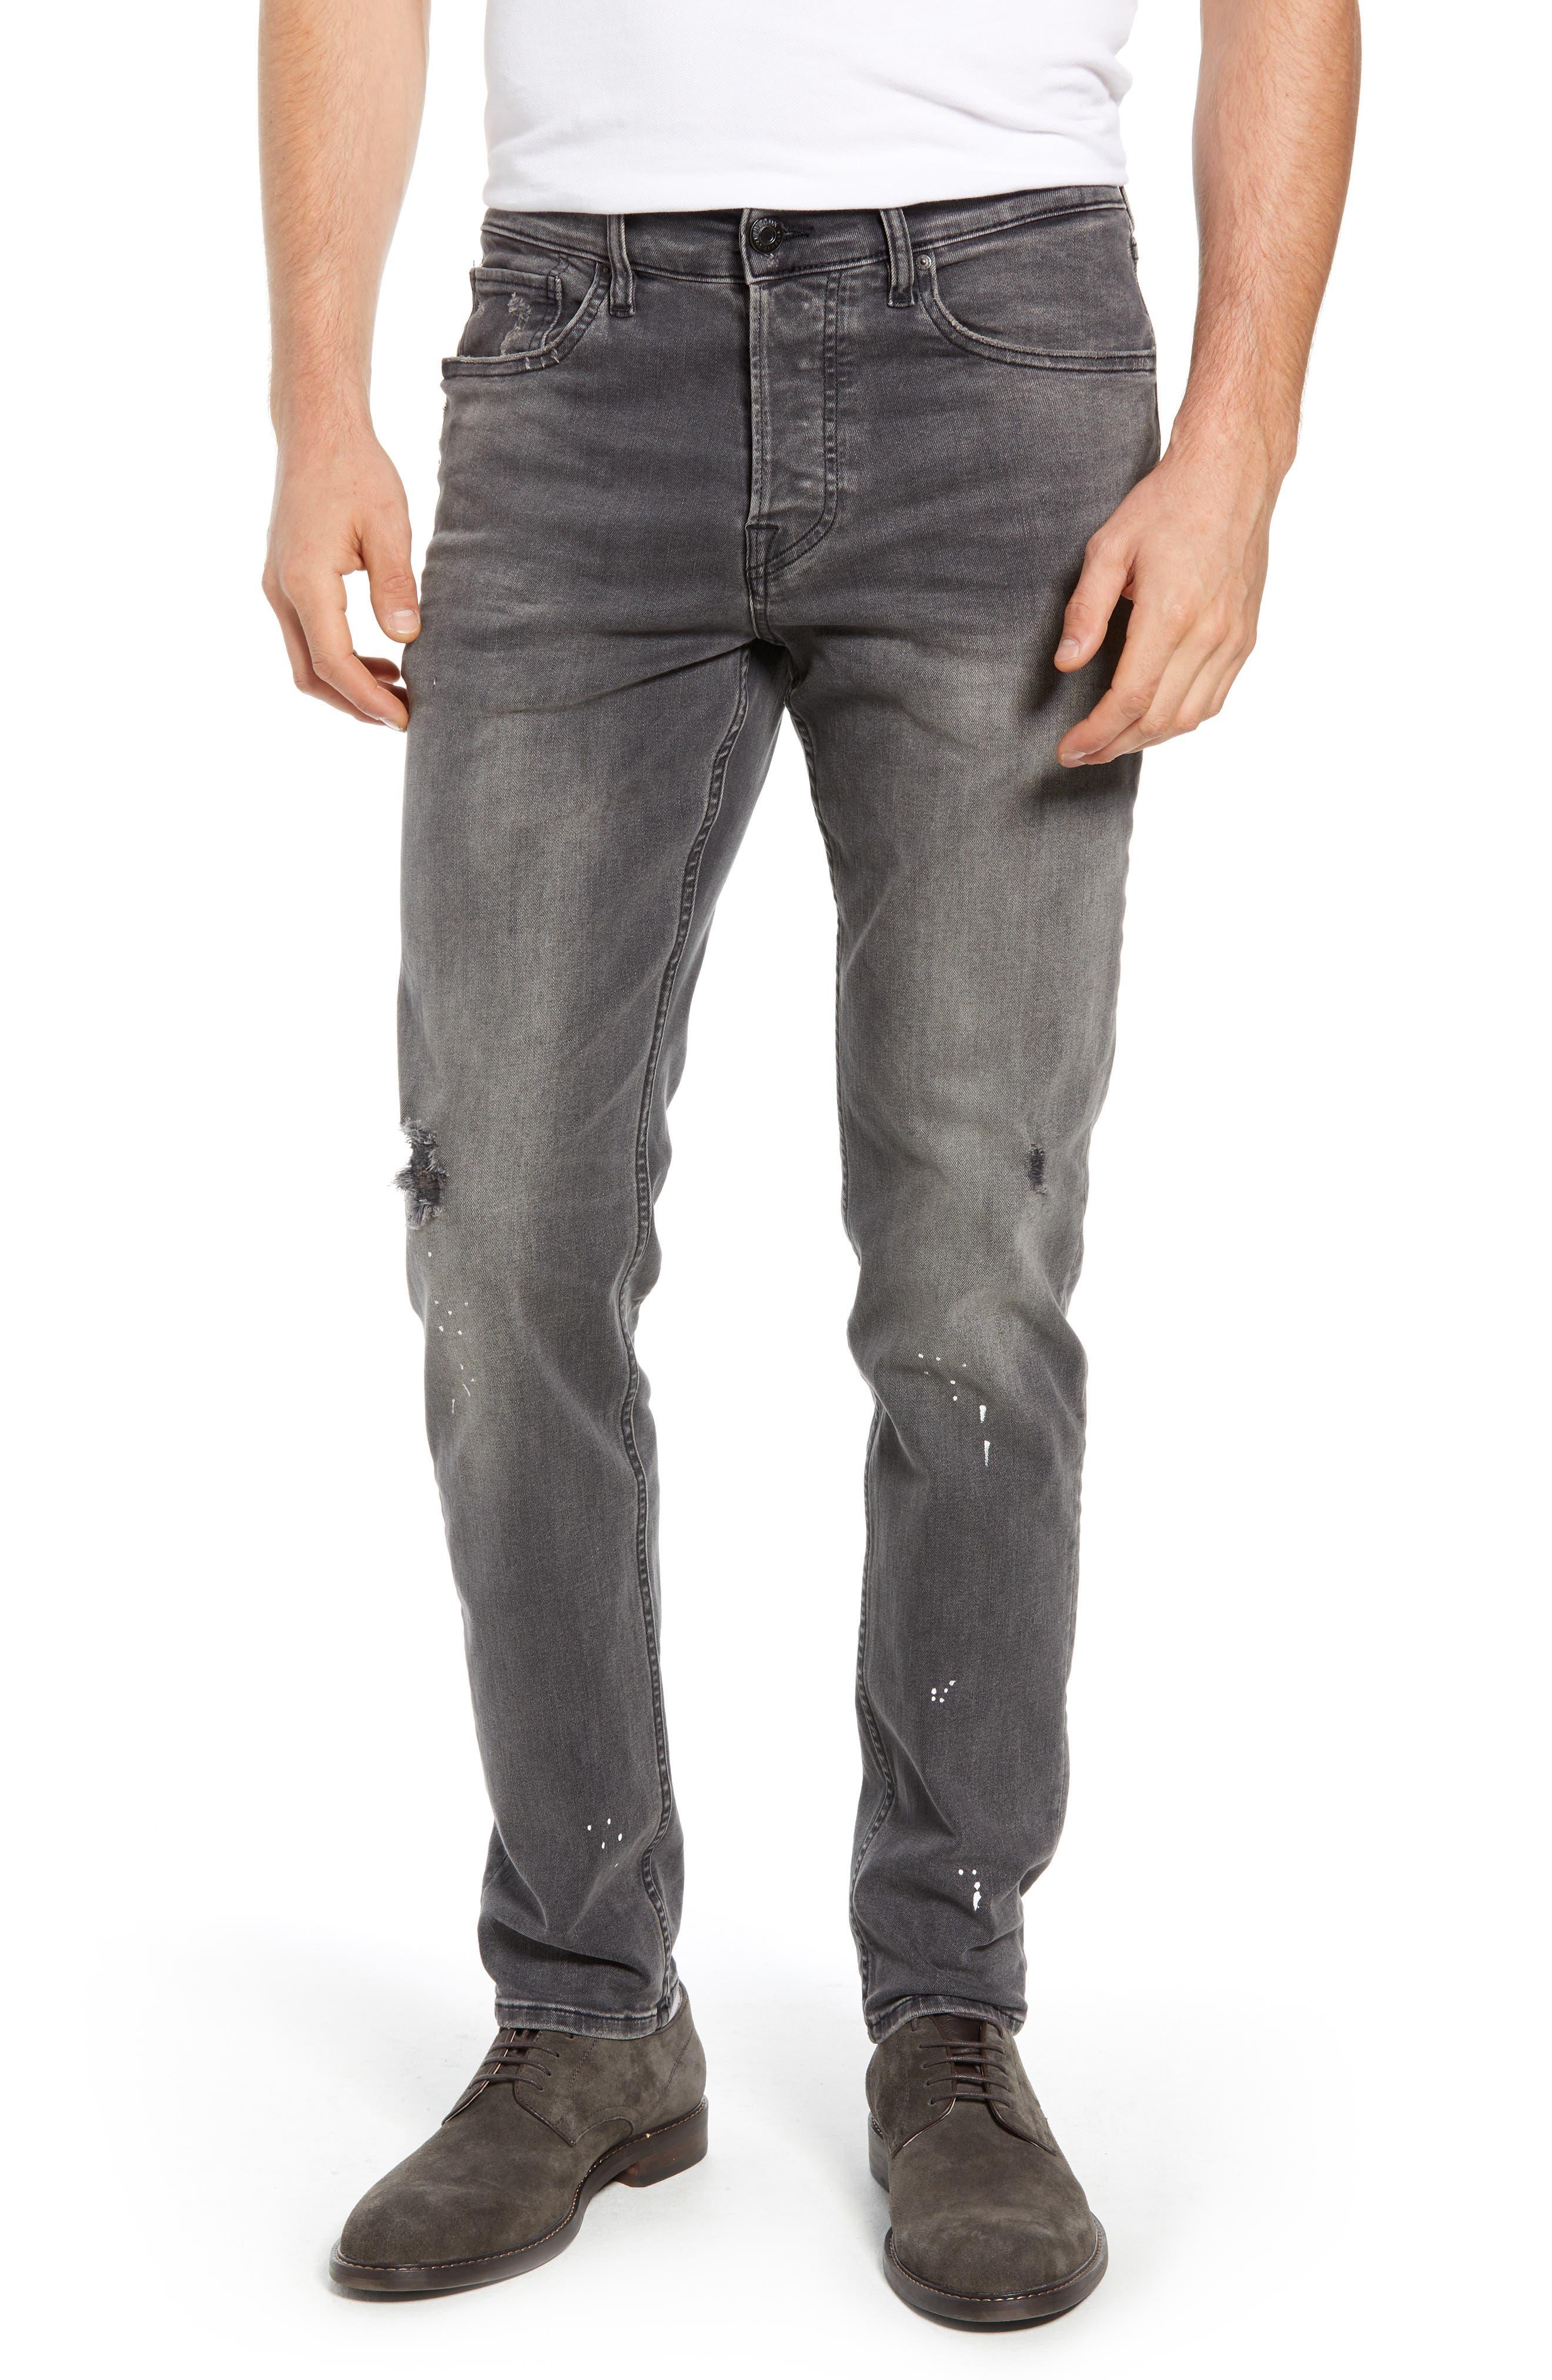 Sartor Slouchy Skinny Fit Jeans,                             Main thumbnail 1, color,                             LANG